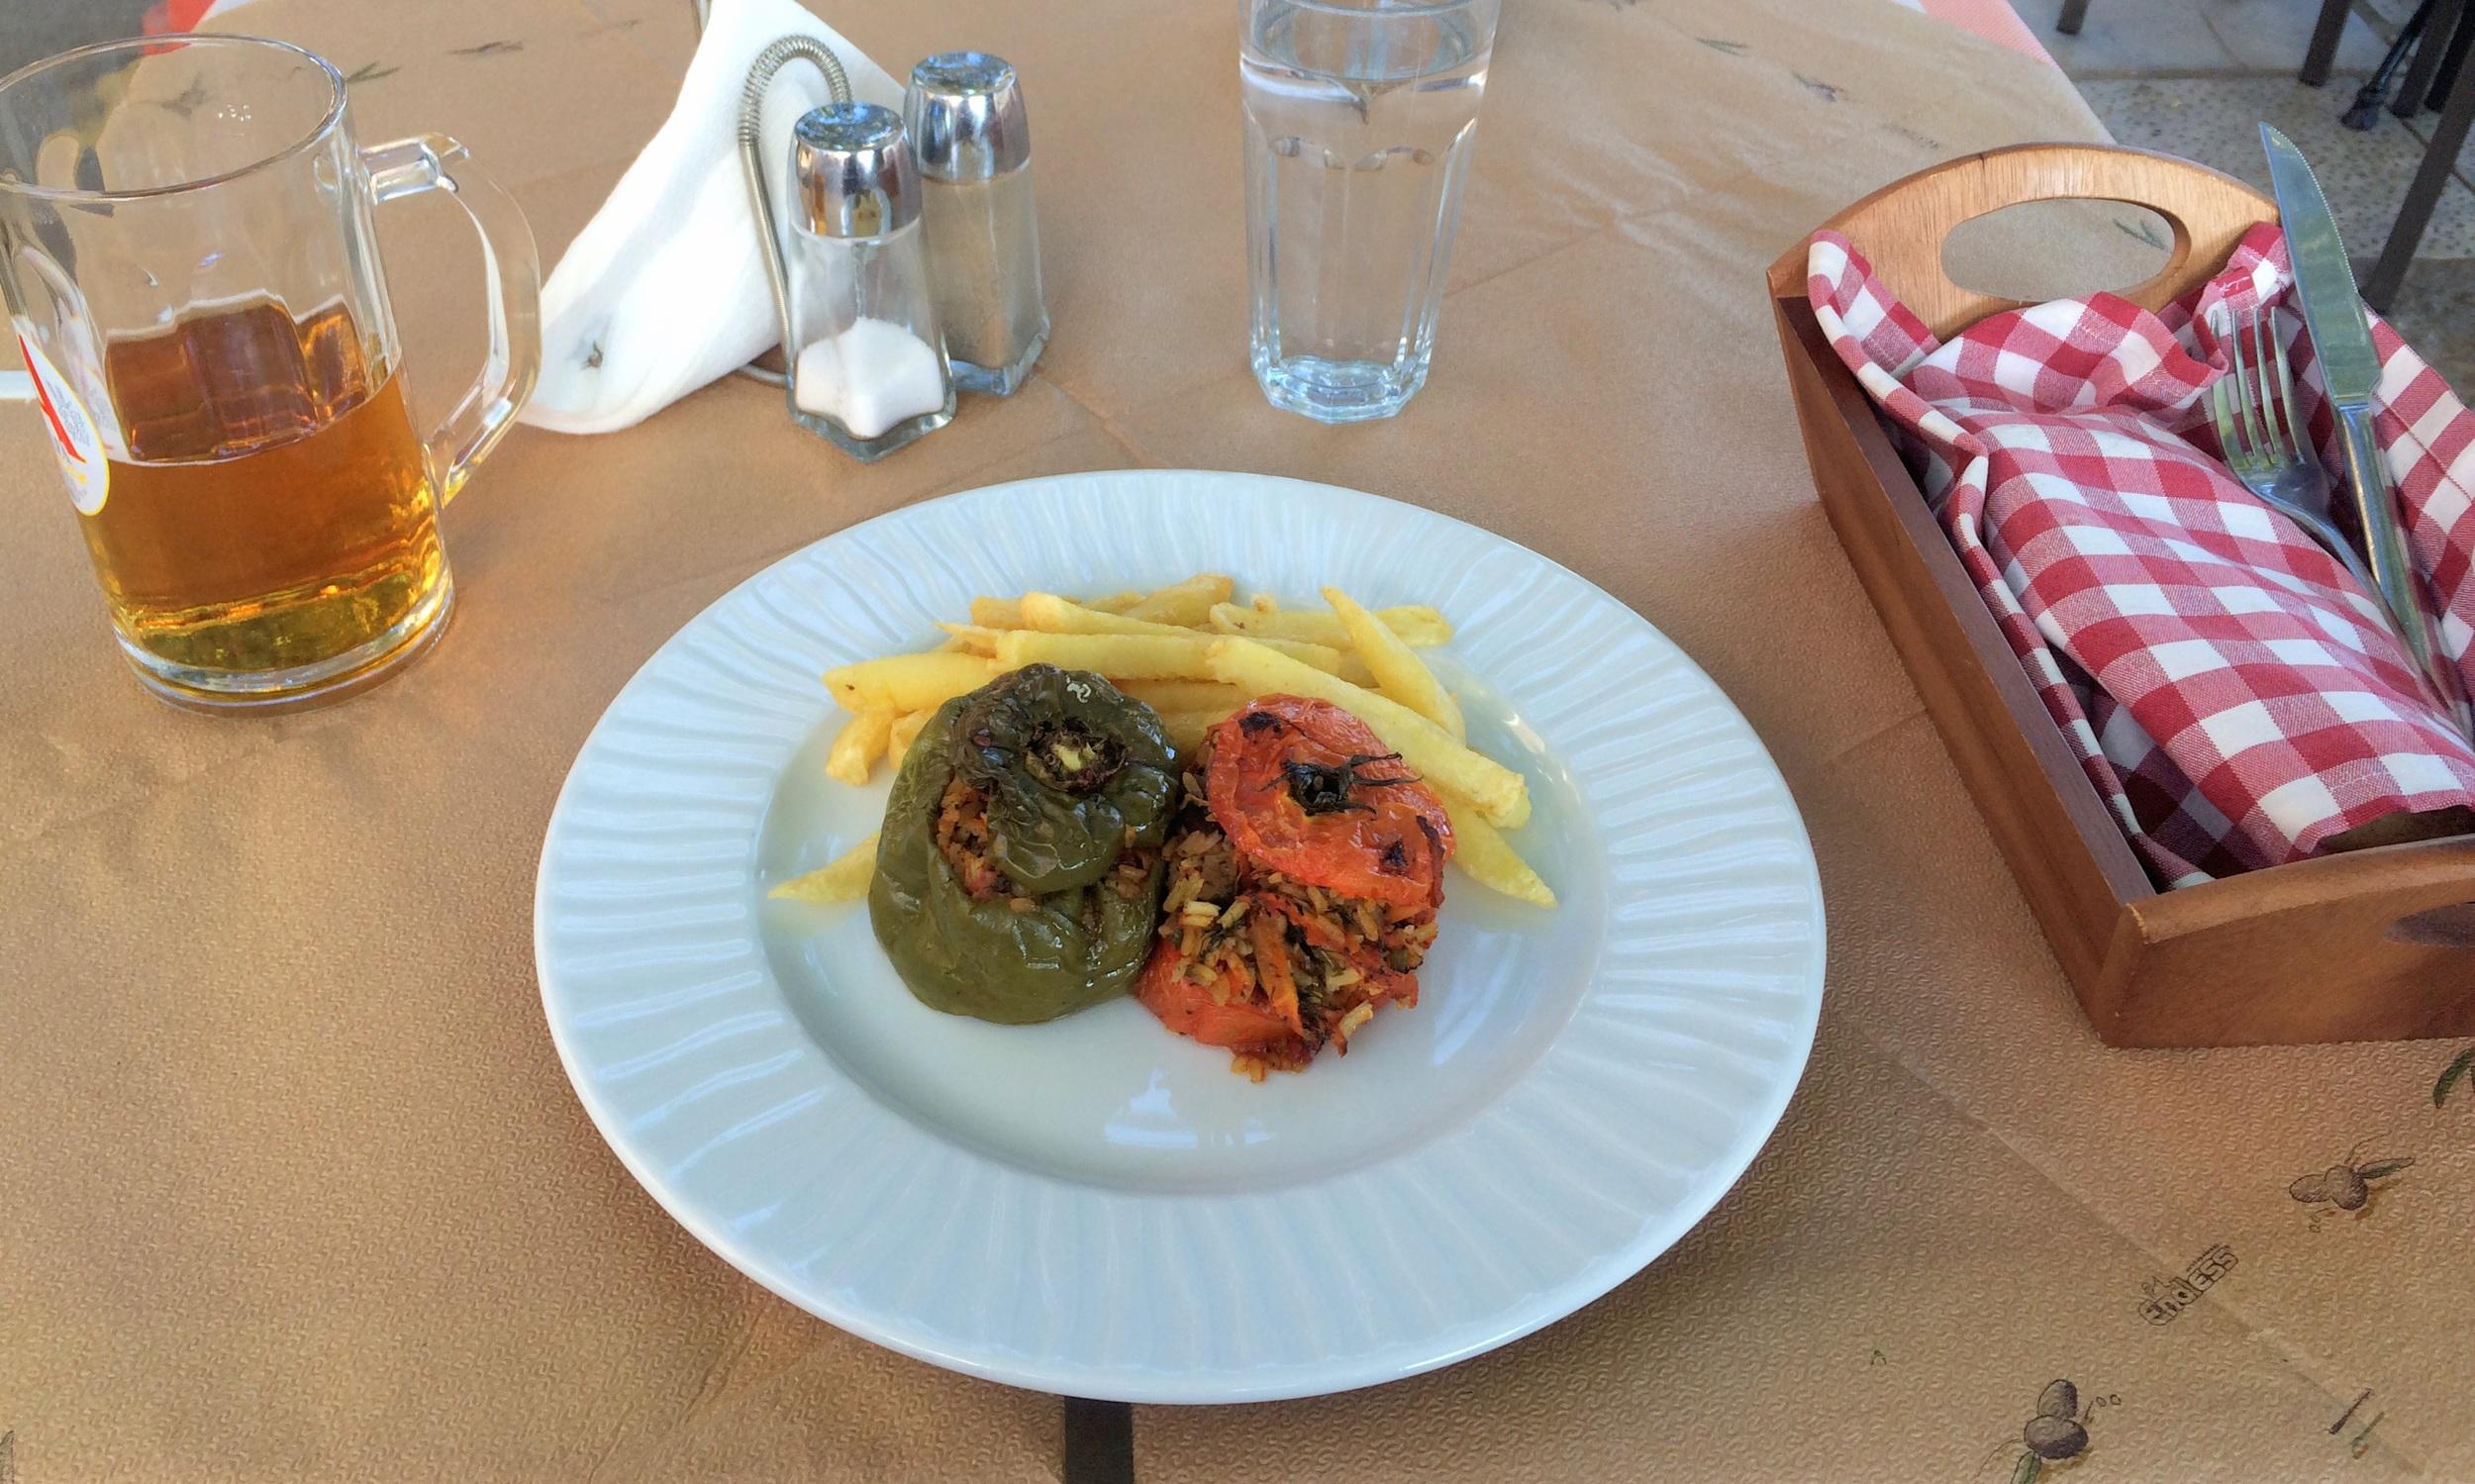 Stuffed tomato and pepper.